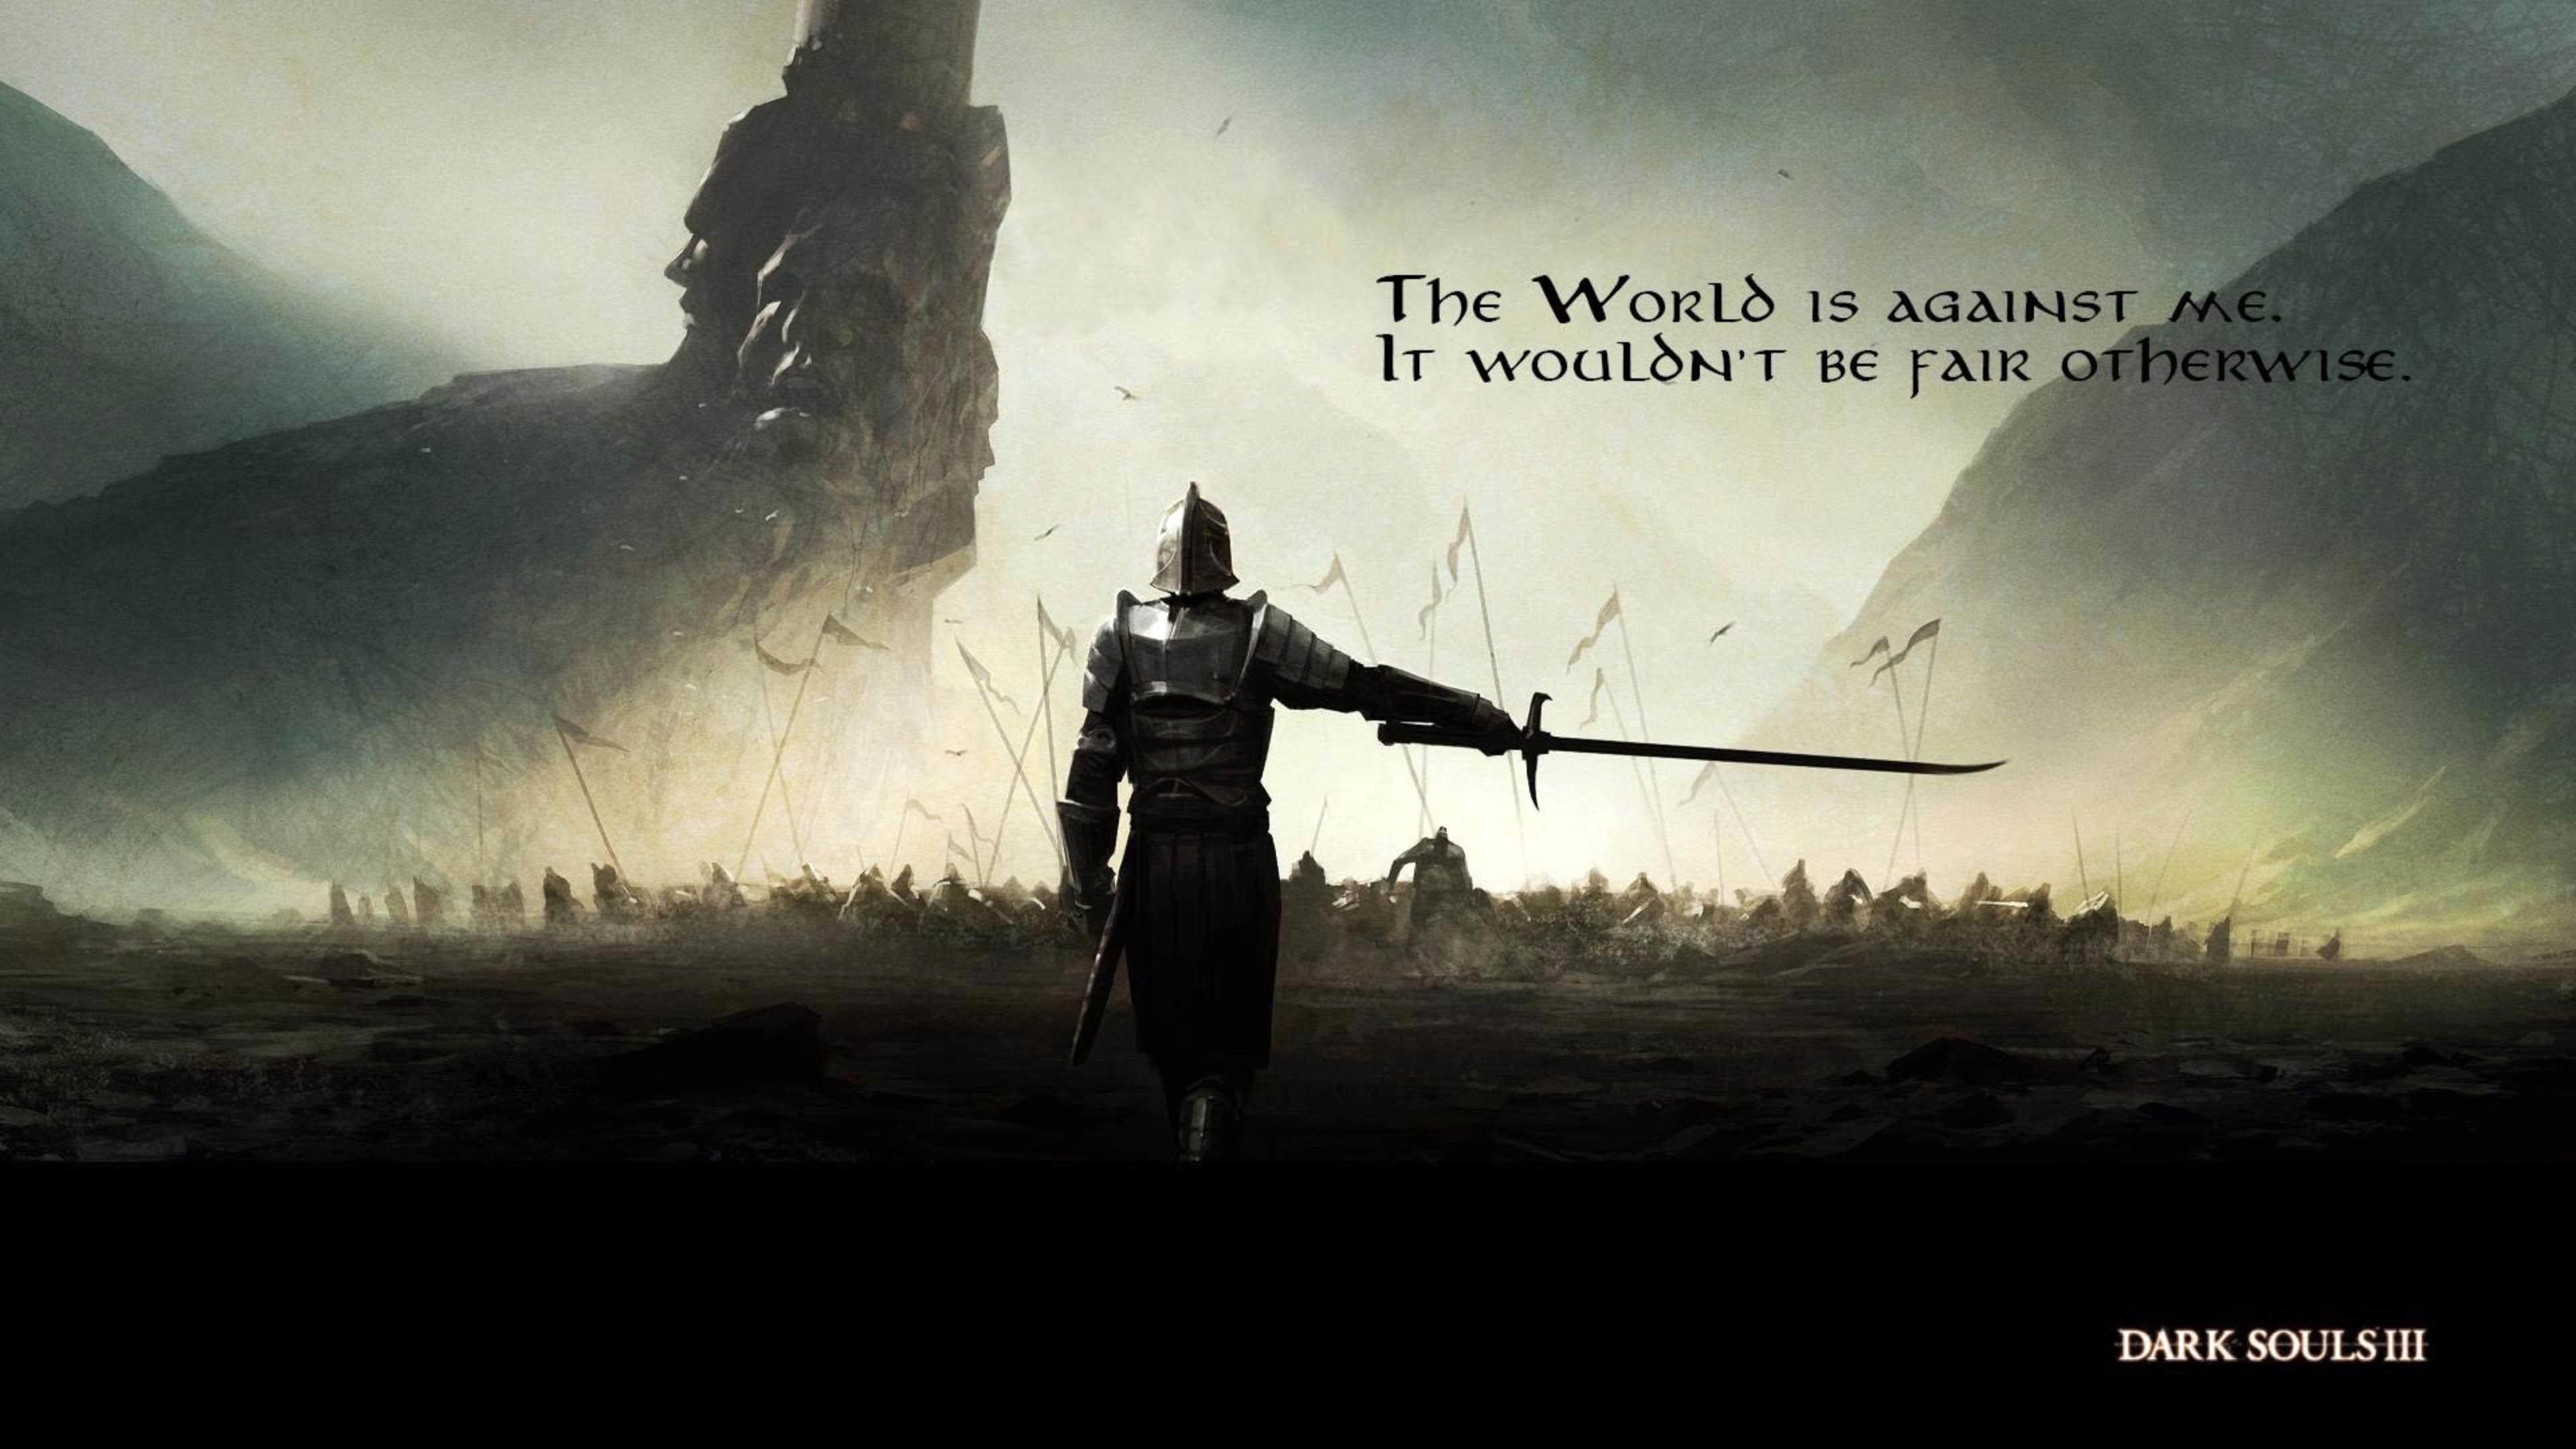 Dark Souls 3 wallpaper